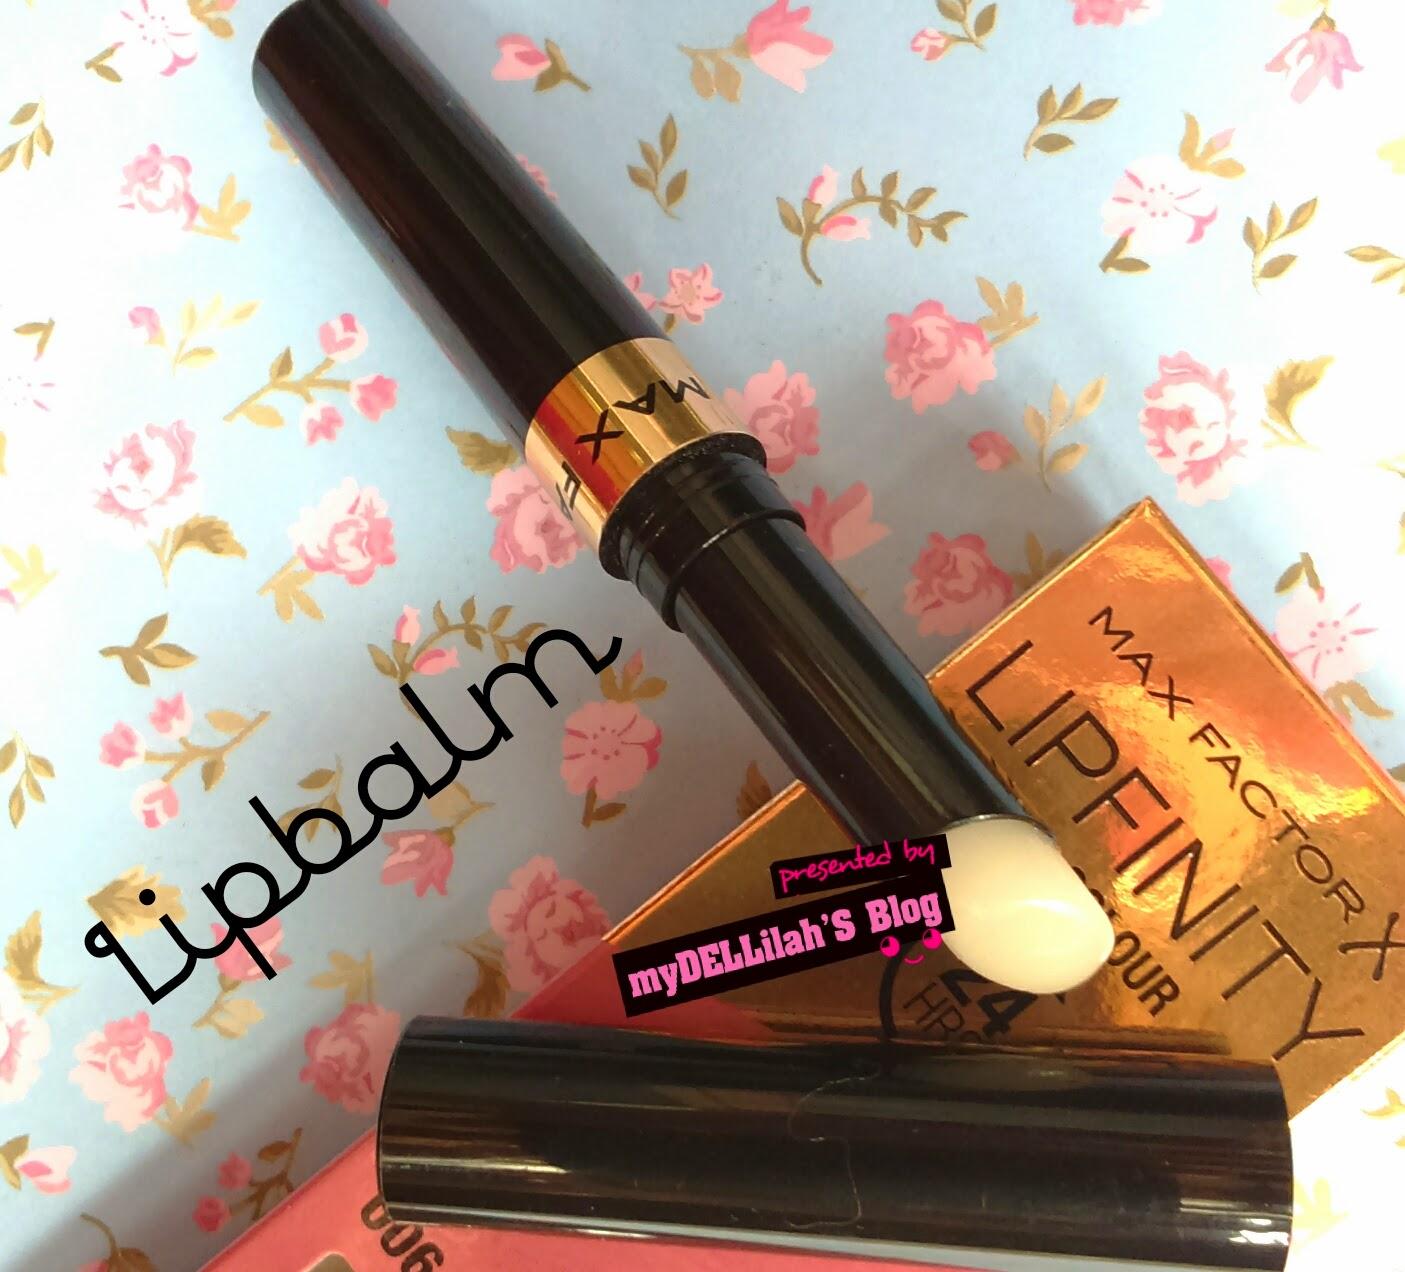 Max Factor Lipfinity - Lipstik 24 Jam Shade Always Delicate